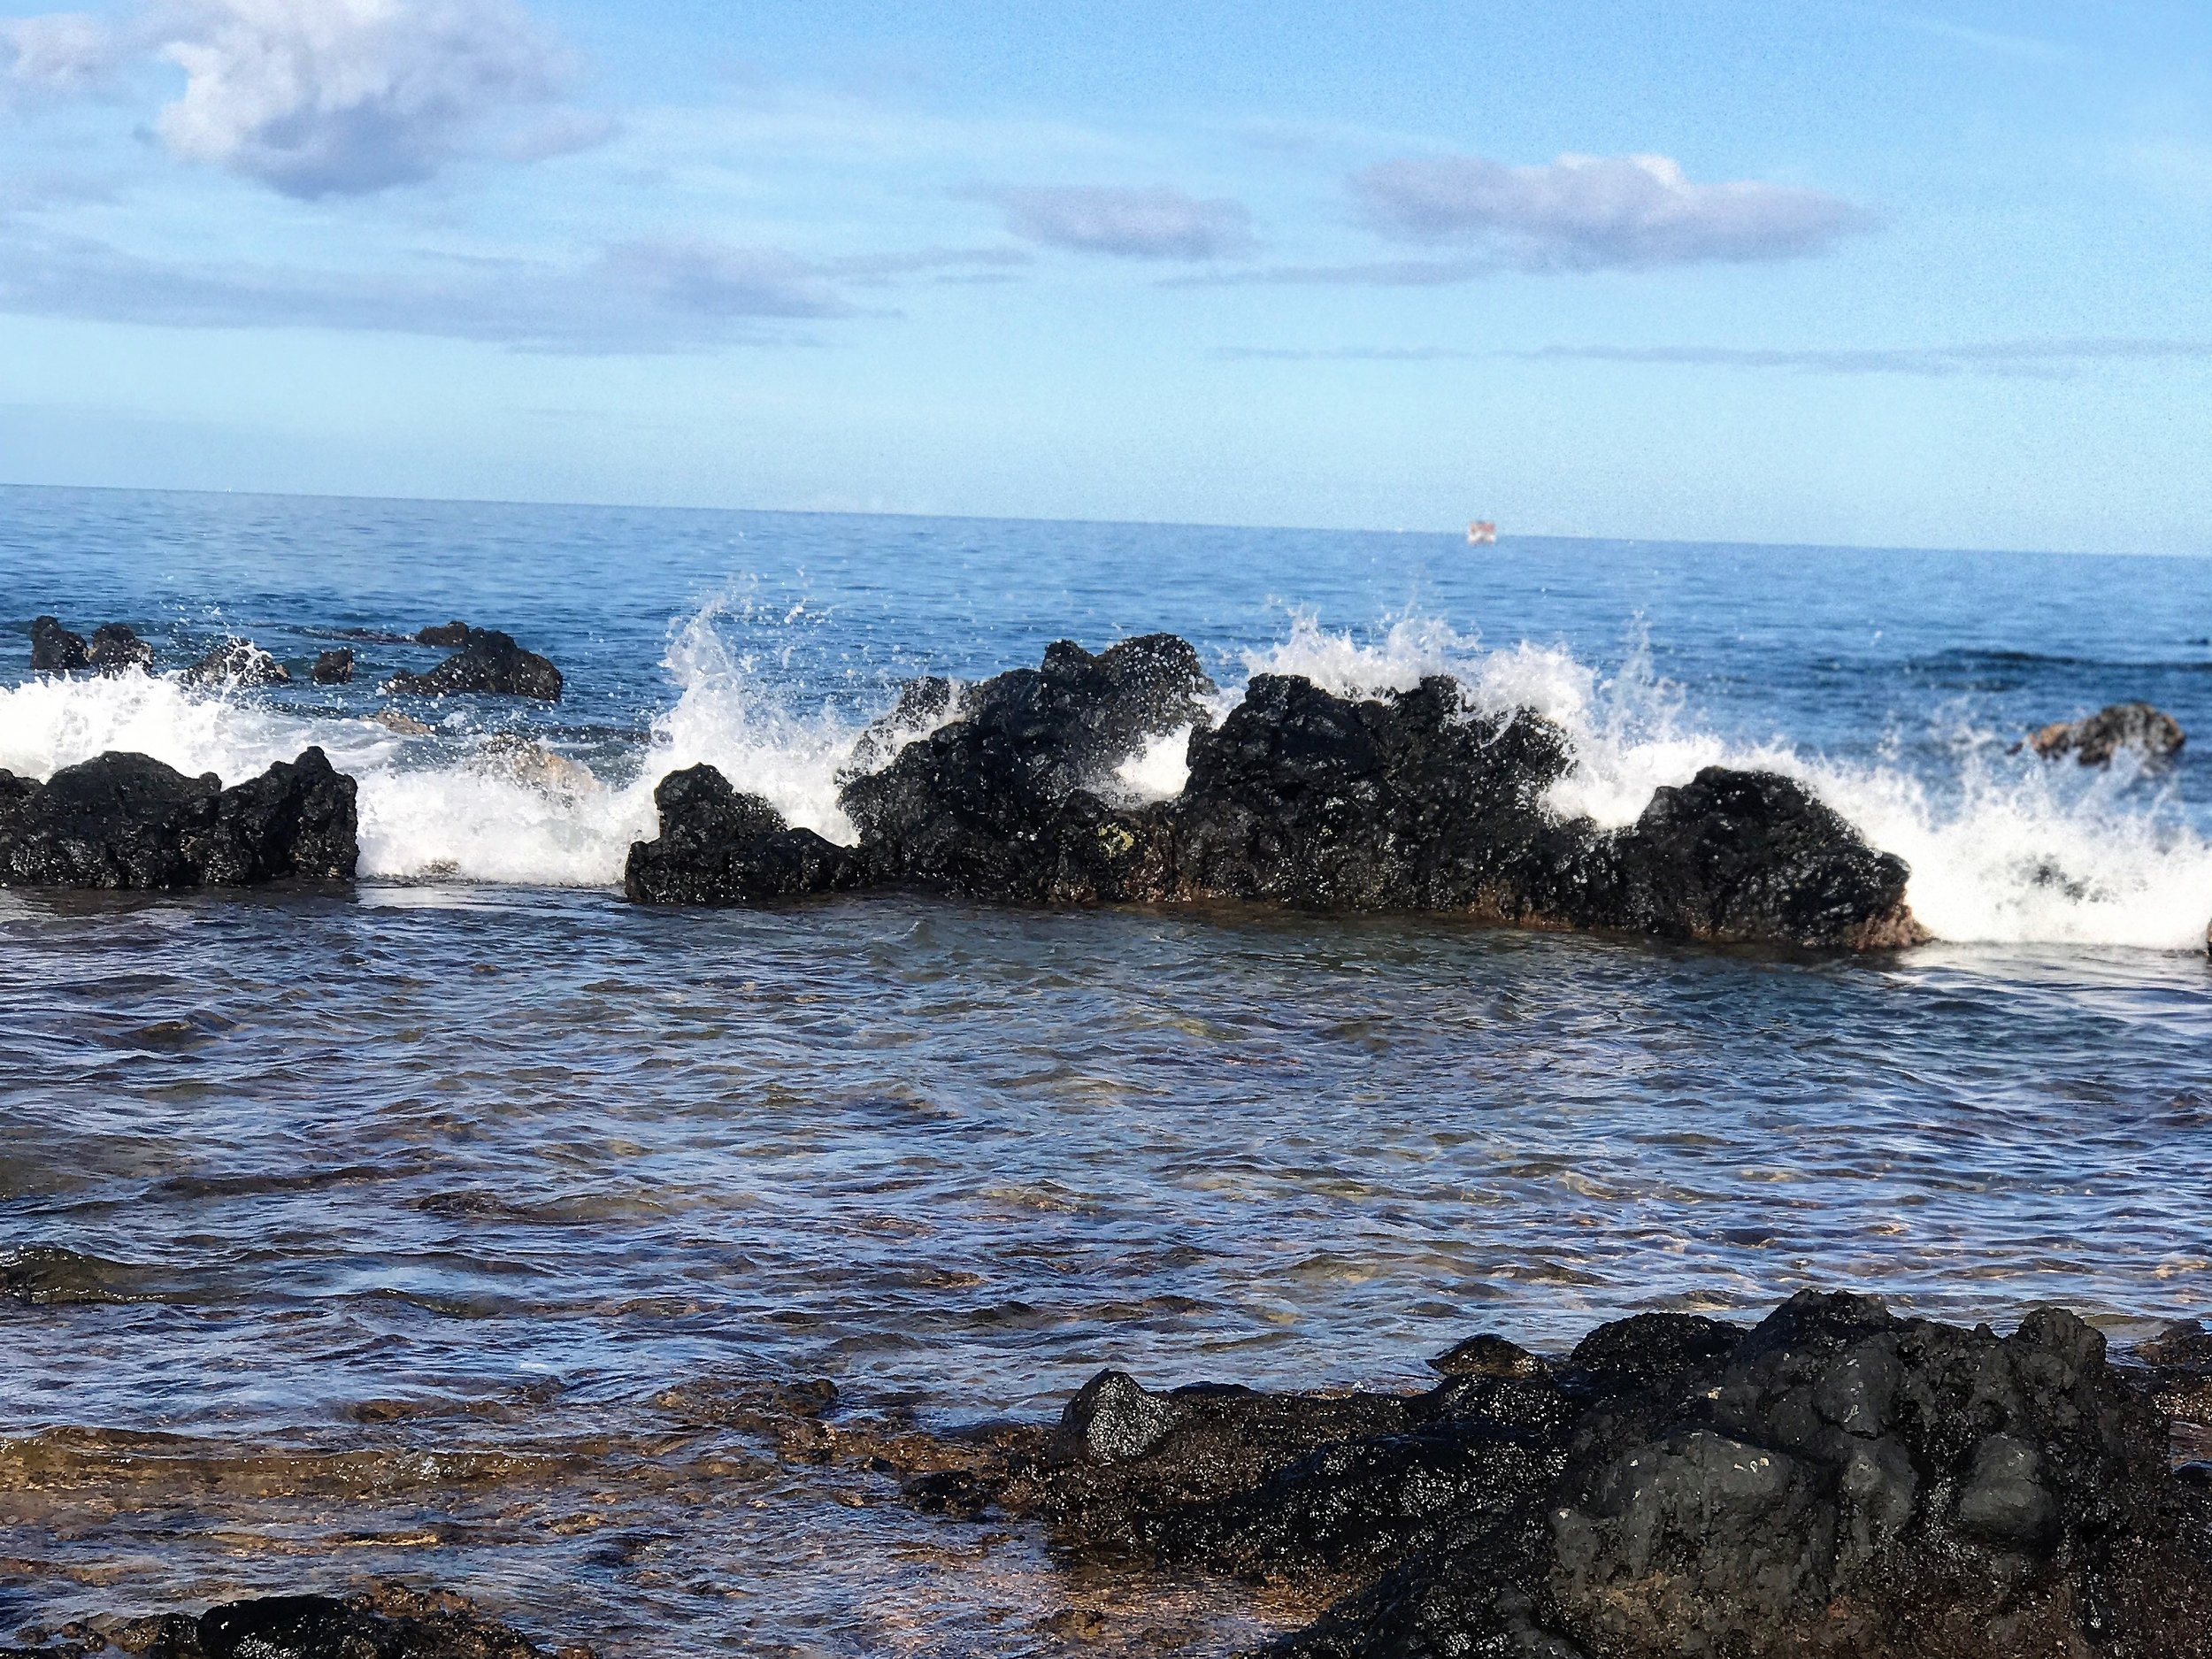 Waves on the beach in Wailea / warpoweft.com